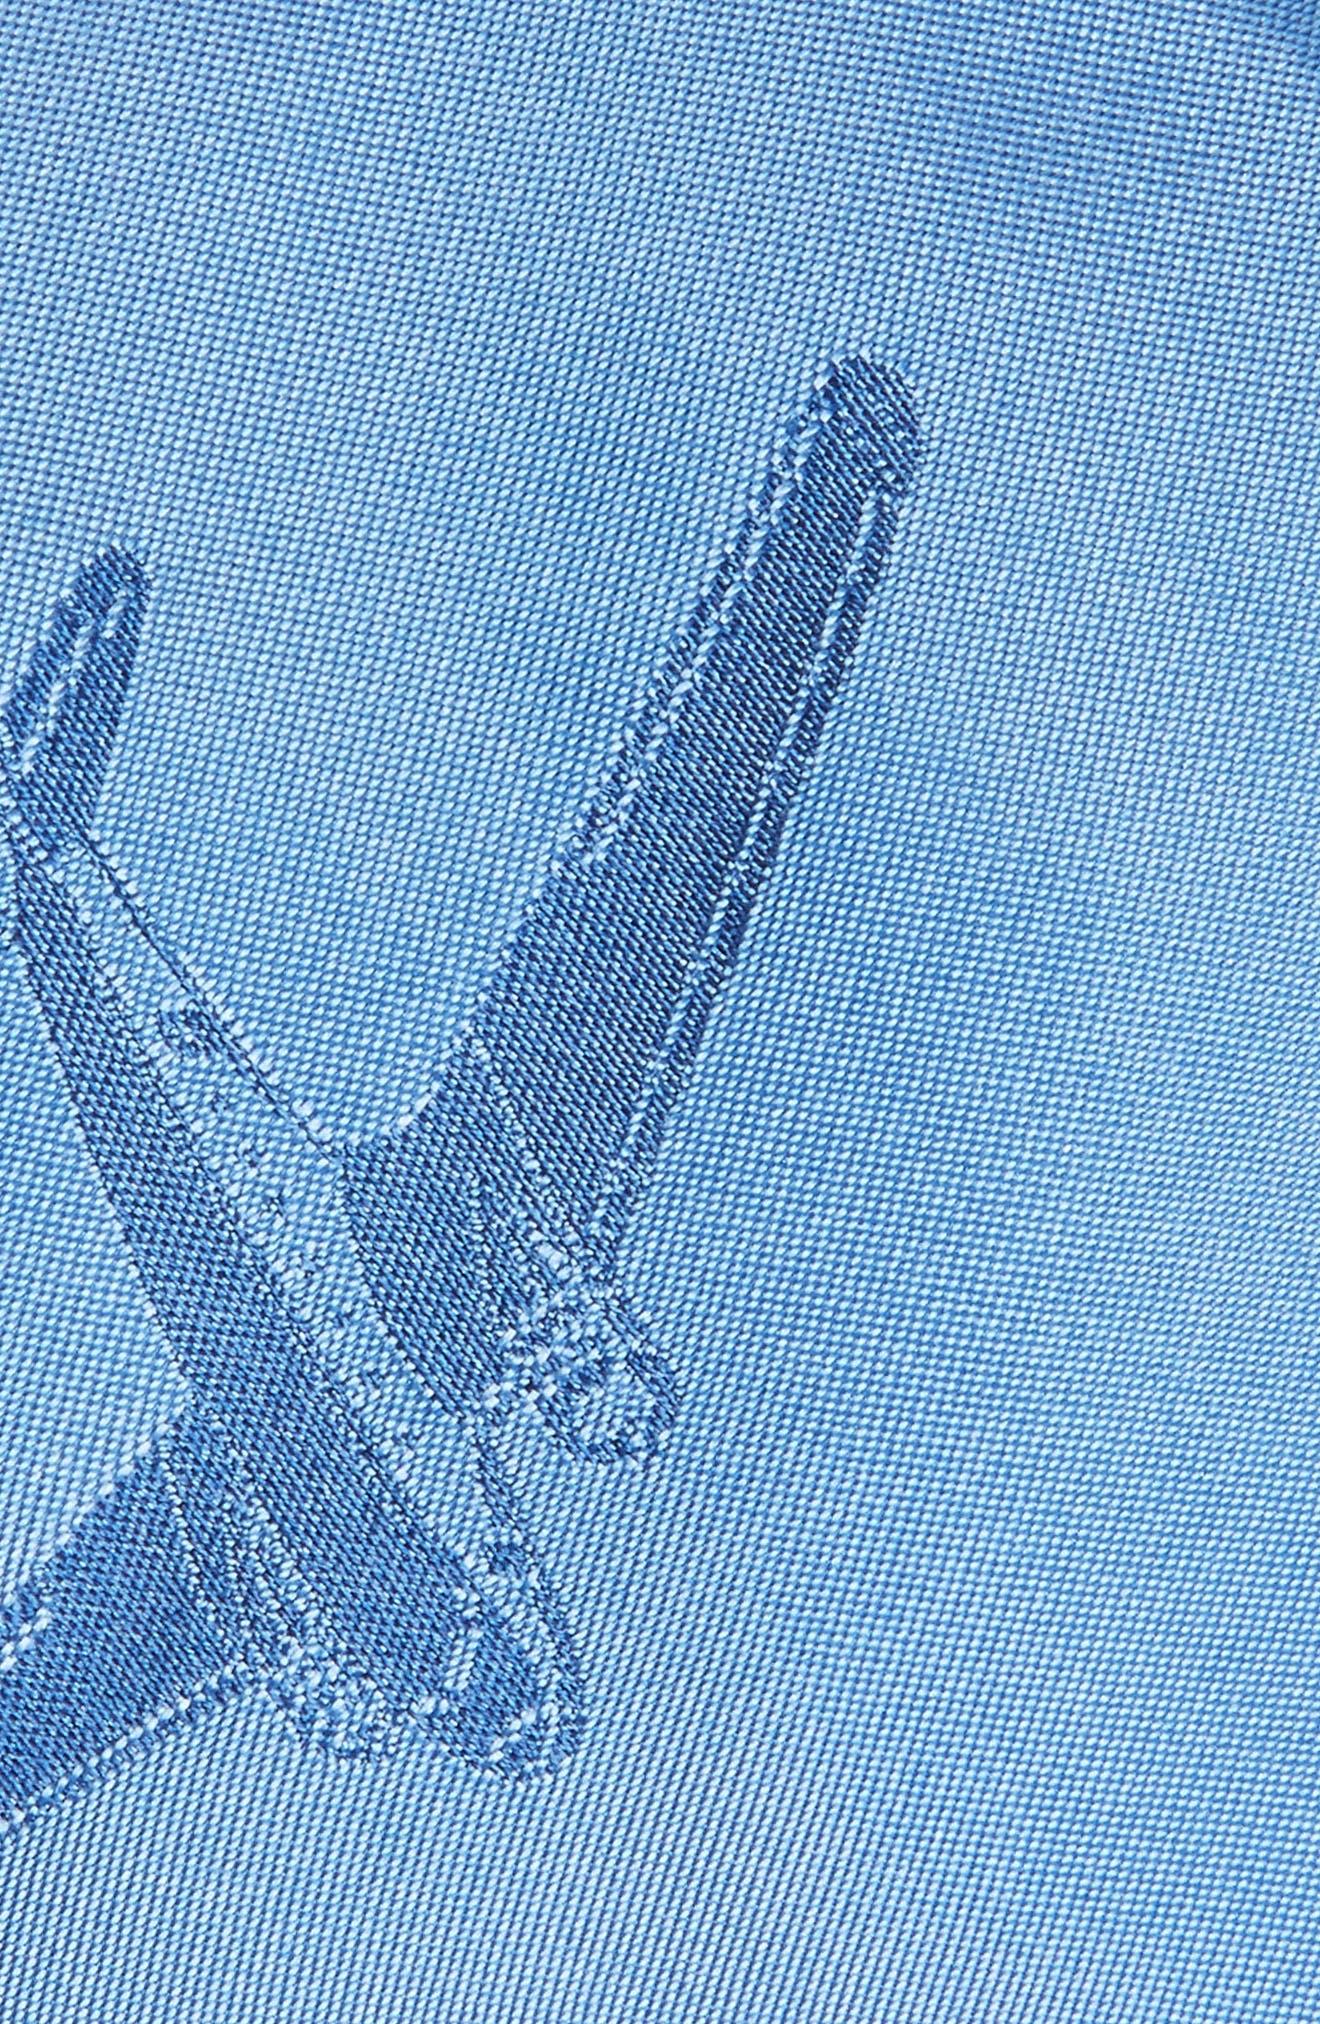 Plane Print Silk Tie,                             Alternate thumbnail 2, color,                             Blue